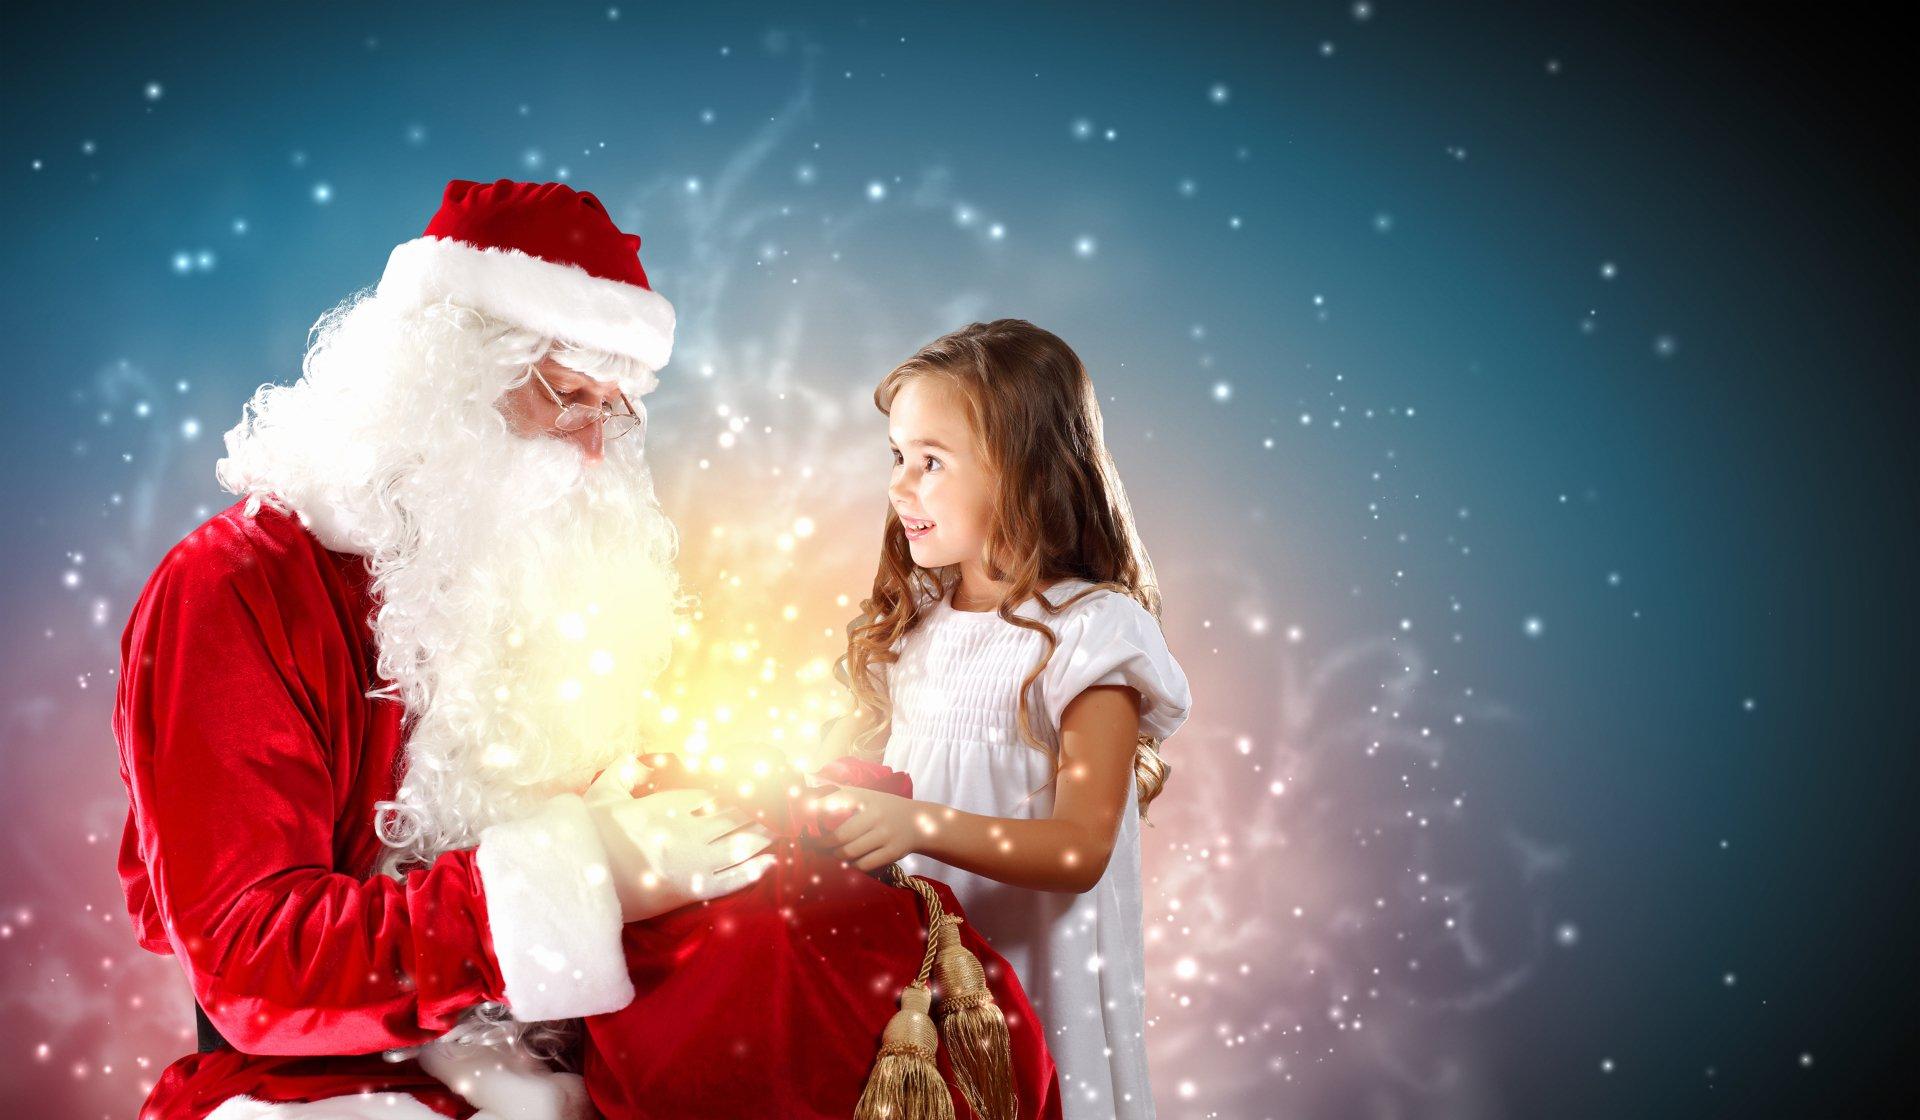 Holiday - Christmas  Santa Child Girl Wallpaper